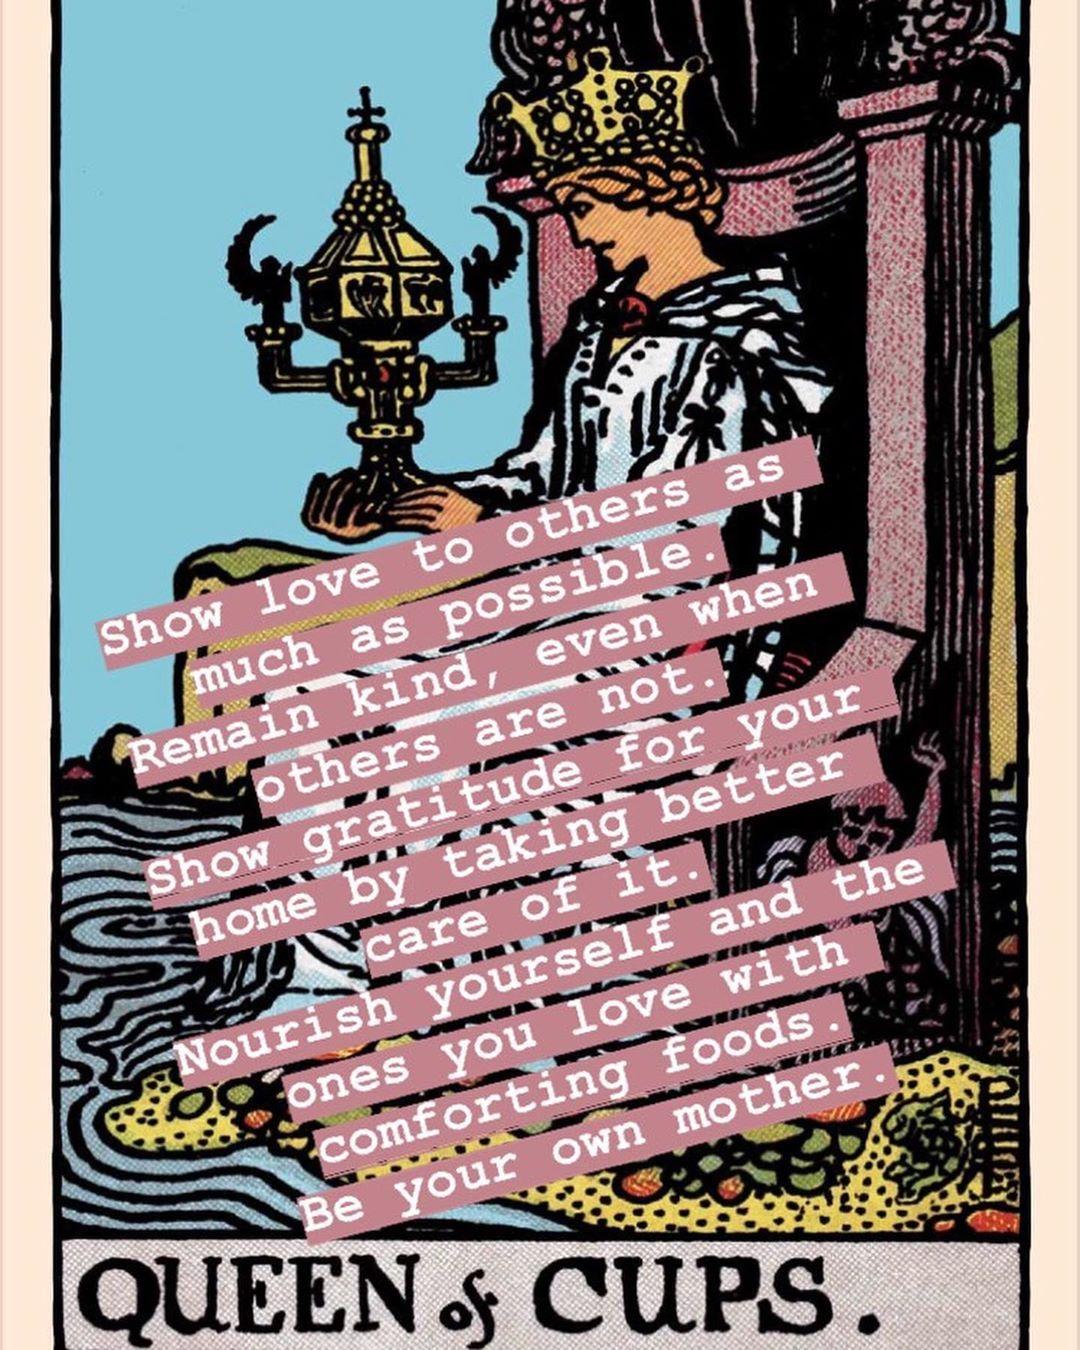 #tarot #tarotreader #tarotreaders #tarotreadersofig #tarotreadersofinstagram #tarotreading #tarotreadings #onlinetarotreadings #tarotchallenges #tarotcommunity #tarottribe #tarotspread #tarotspreads #witch #bruja #grannywitch #occultism #pagansofinstagram #paganism #craft #witchcraft #brujeria